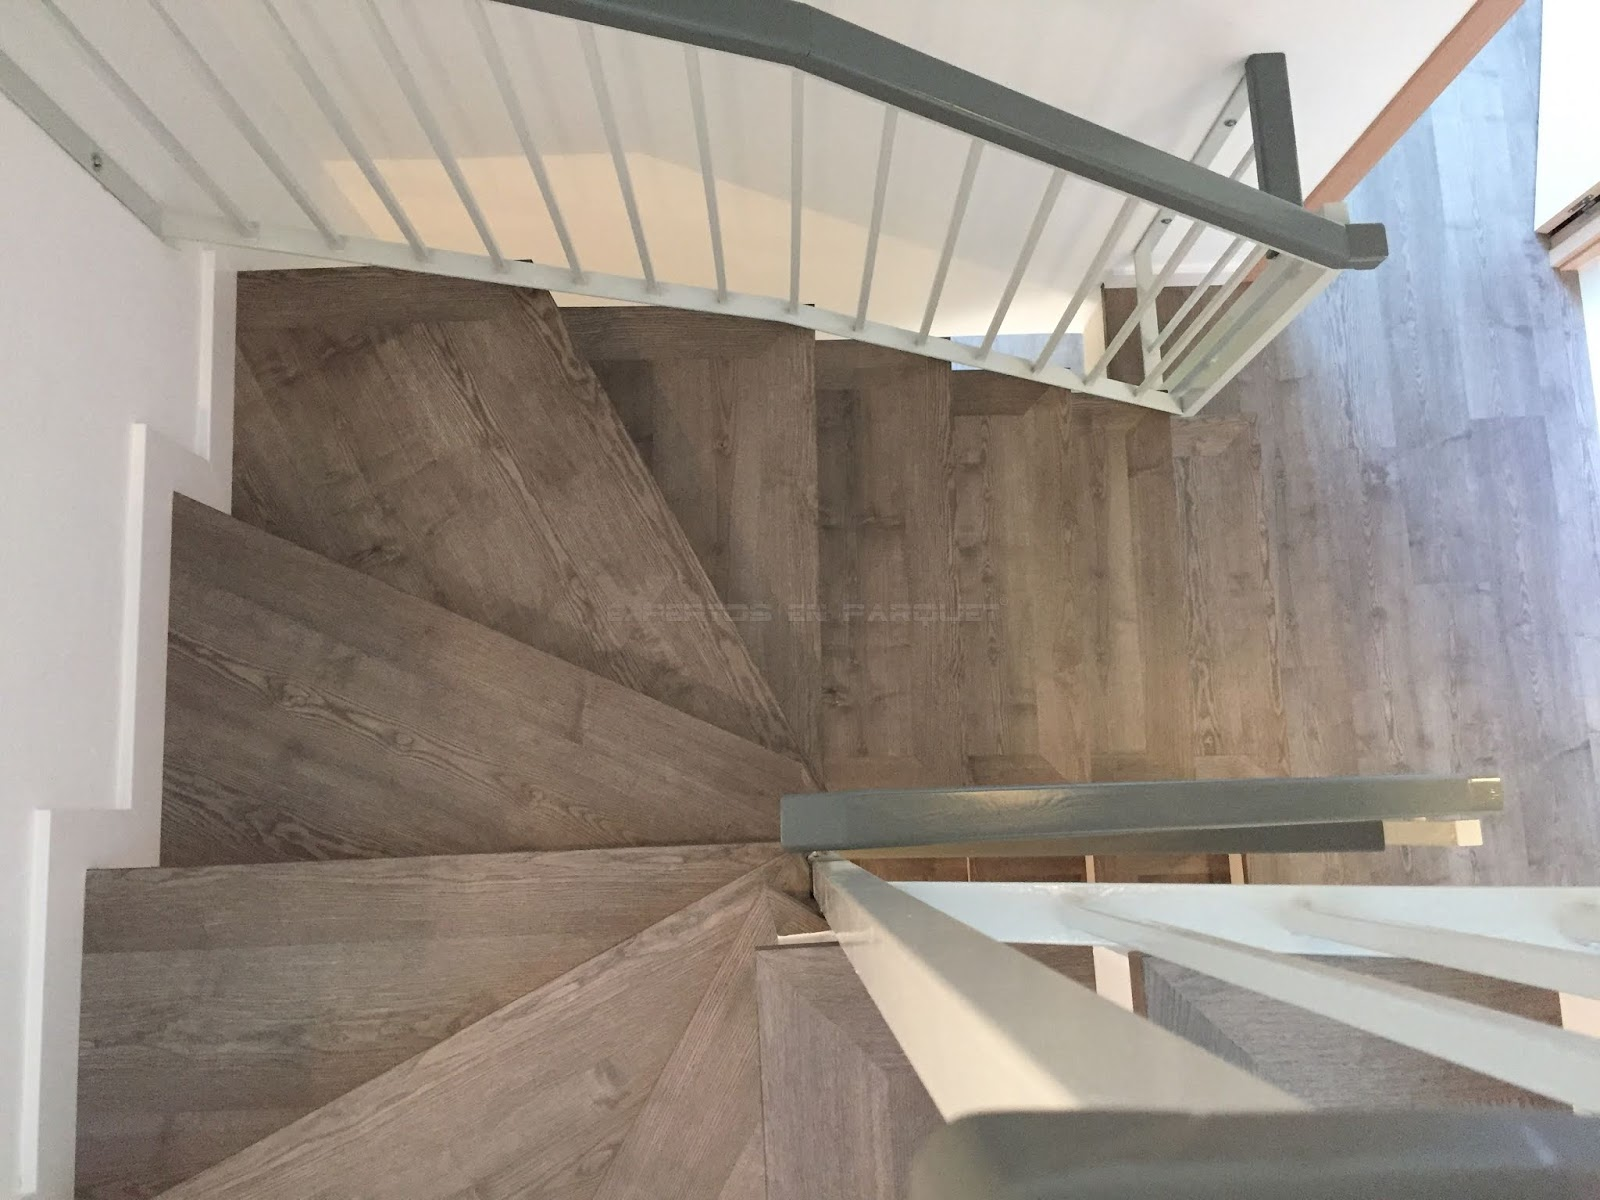 Forrar Escaleras Con Parquet Tarima O Suelo Laminado Tipos